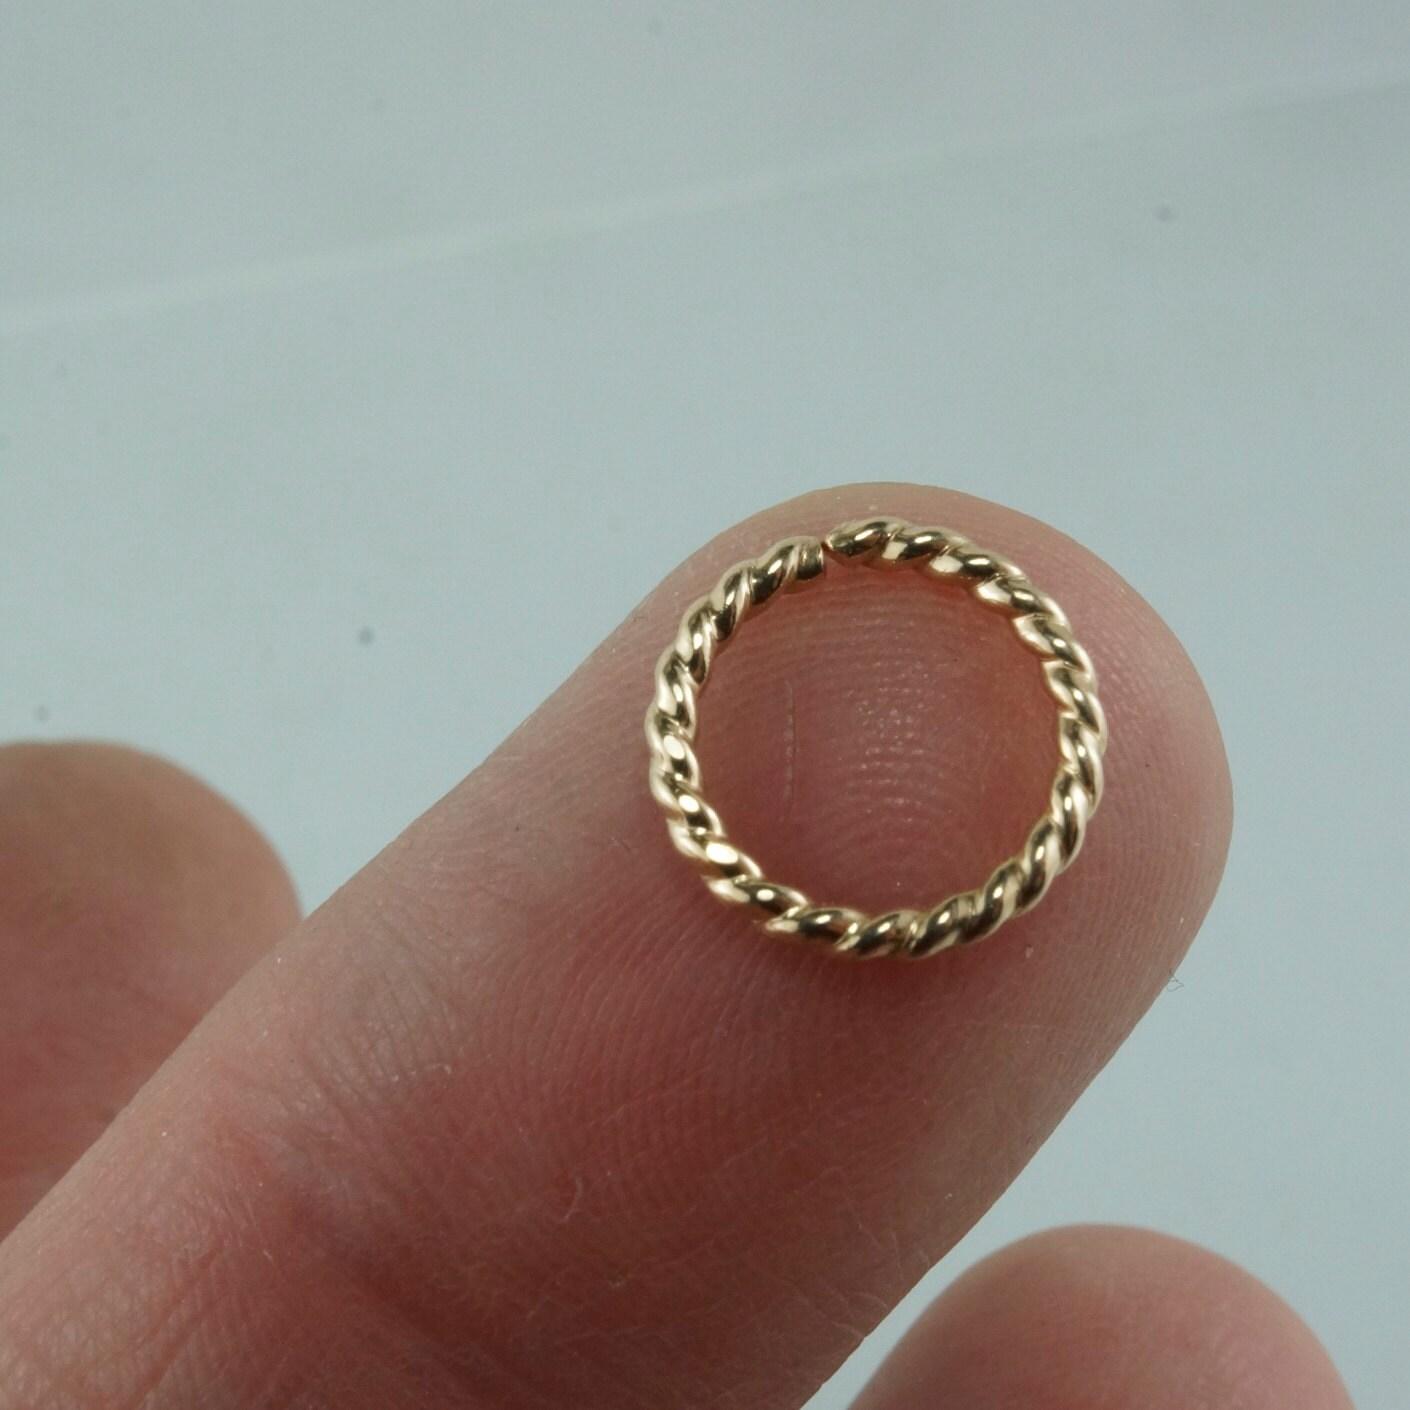 16 cartilage ring 14 kt gold filled by